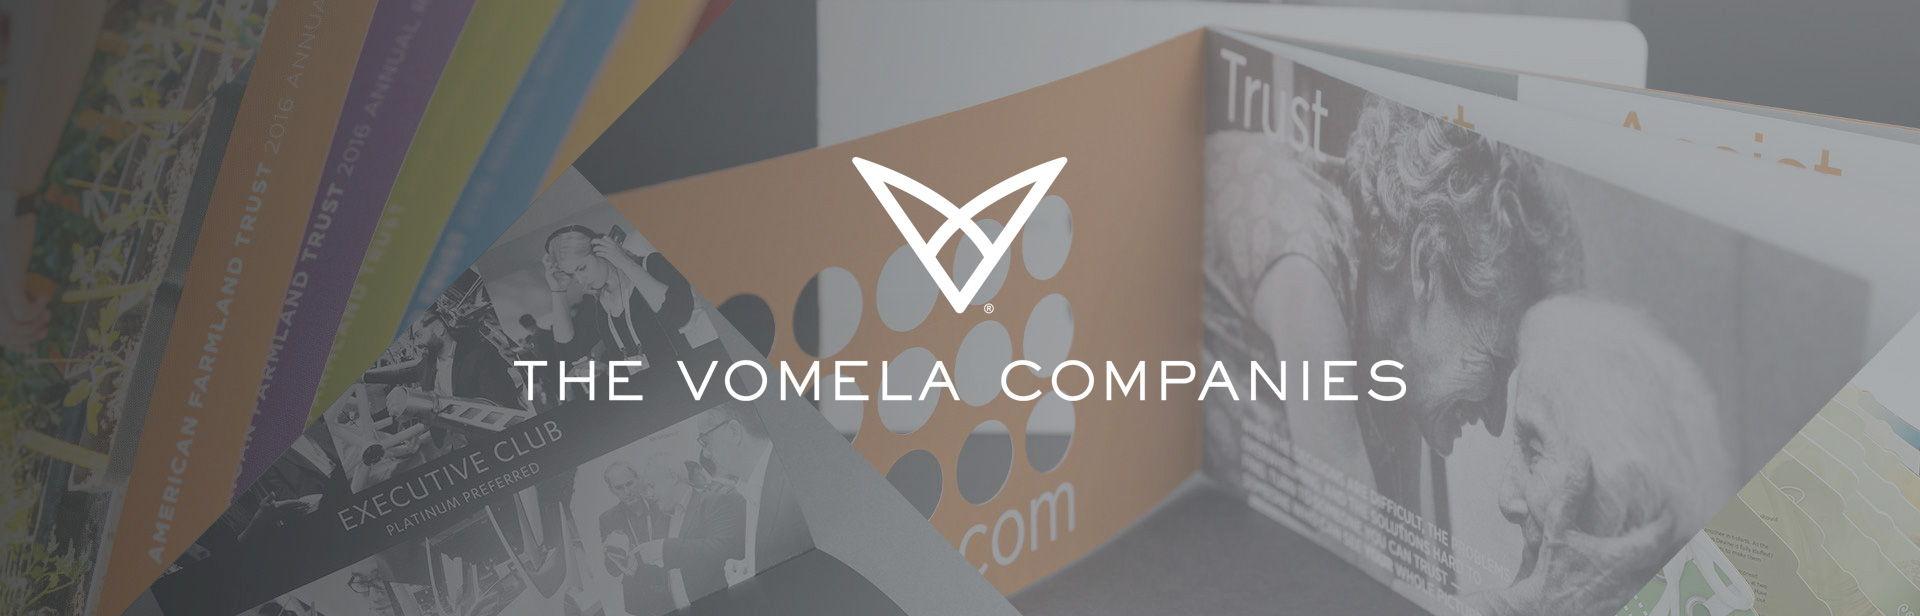 The Vomela Companies